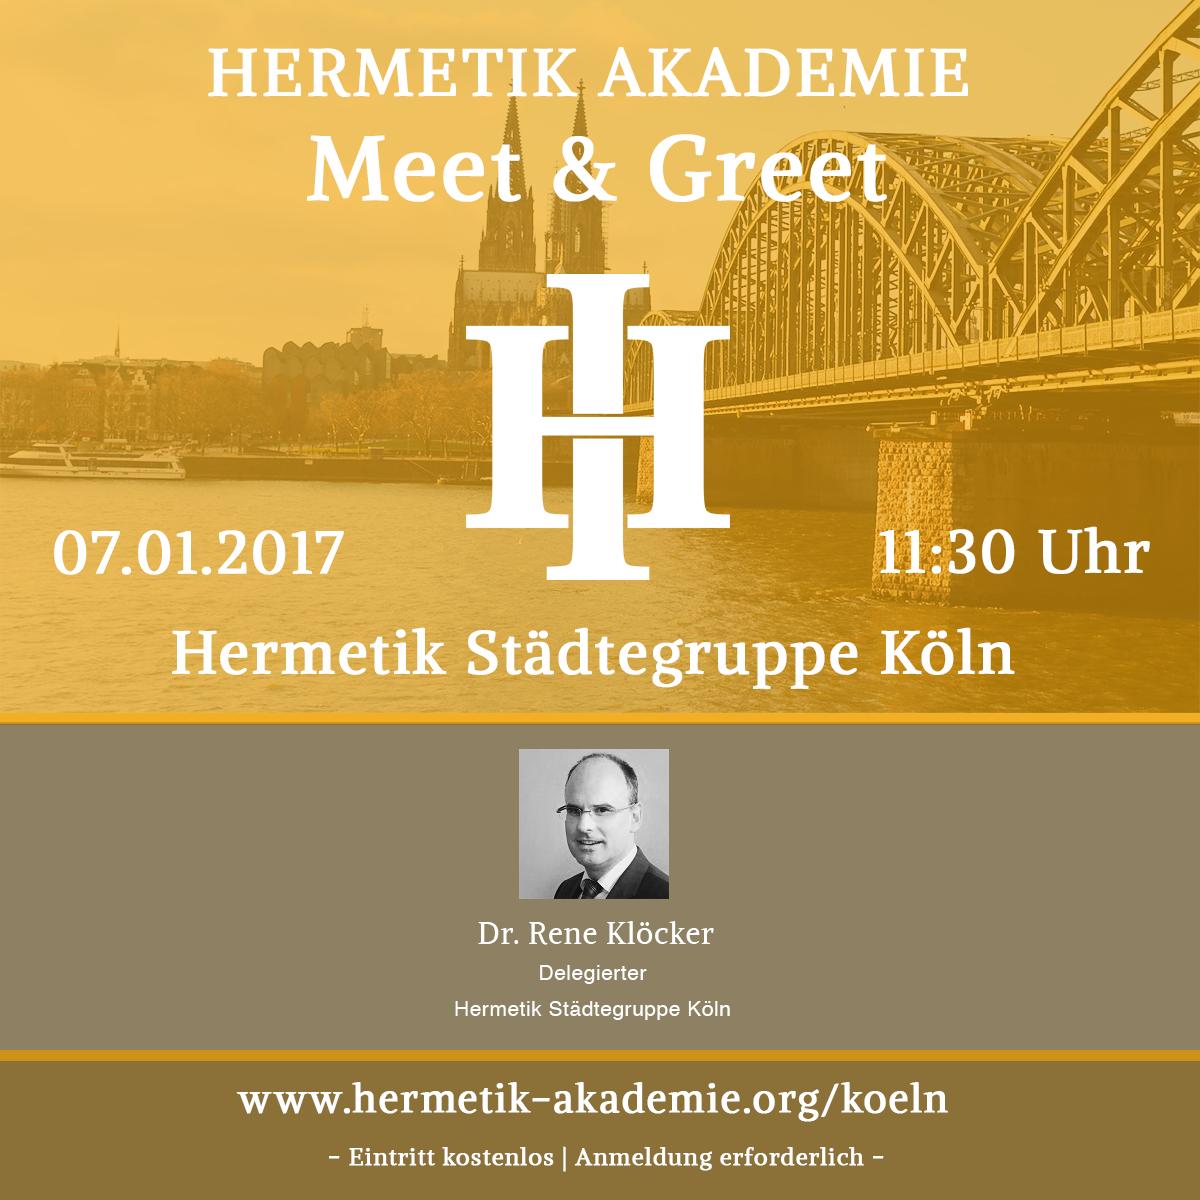 Hermetik Meet & Greet Köln